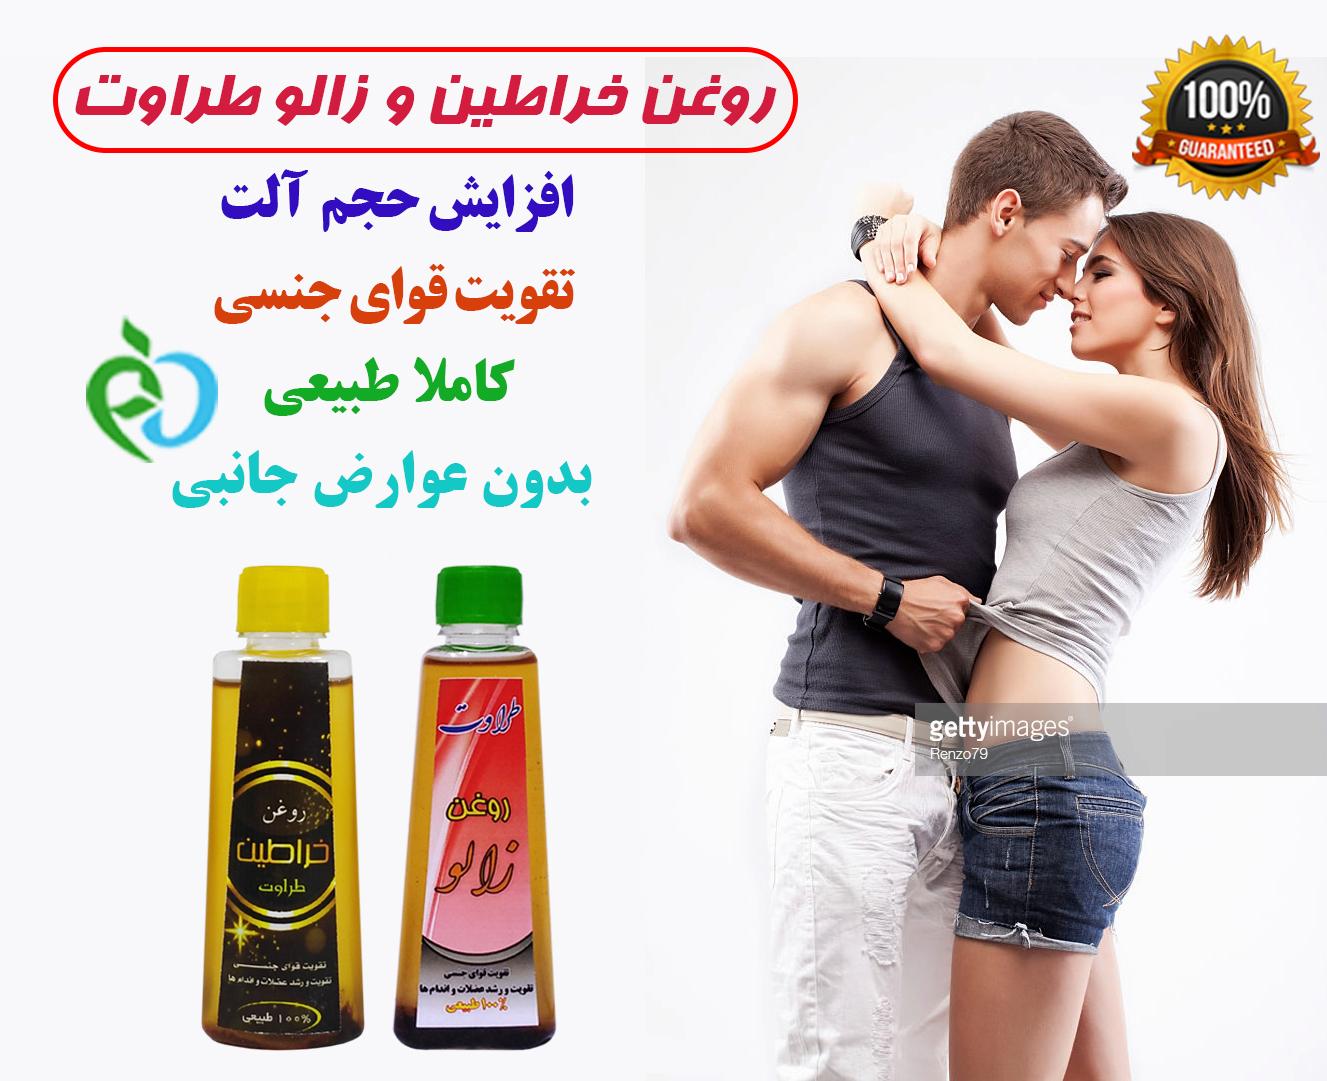 http://s8.picofile.com/file/8358509792/168386407_1024x1024.jpg